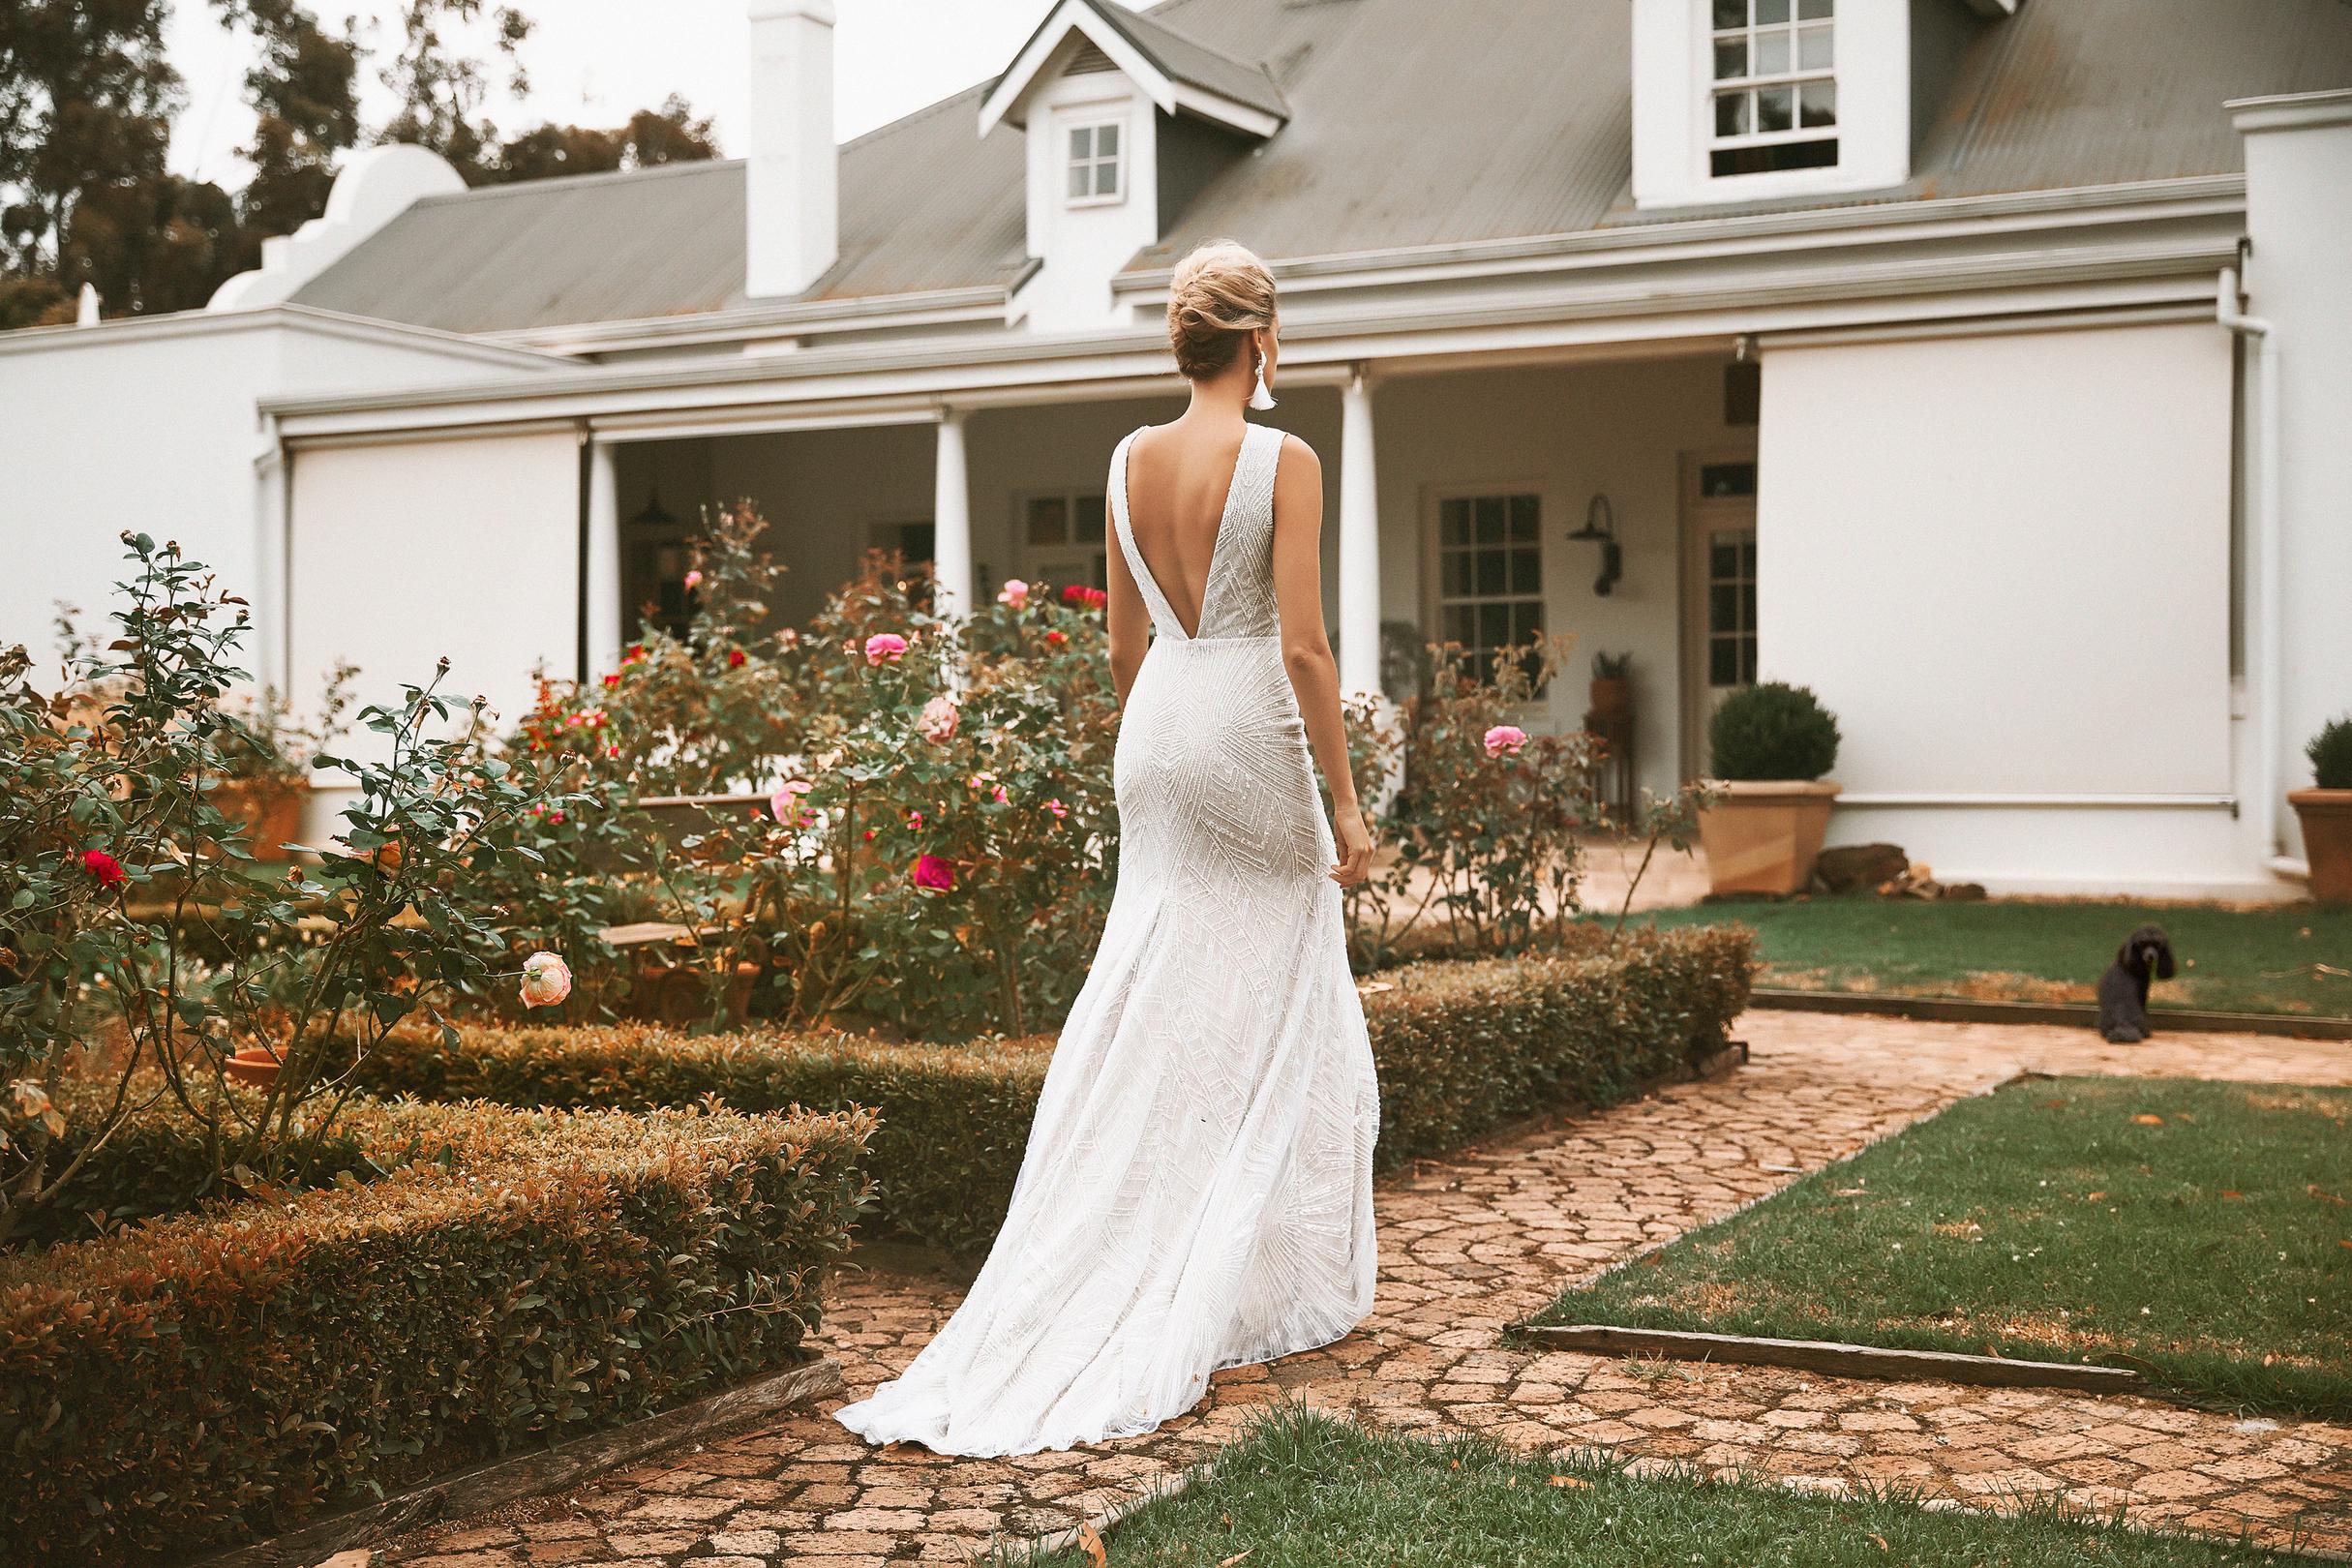 vega dress photo